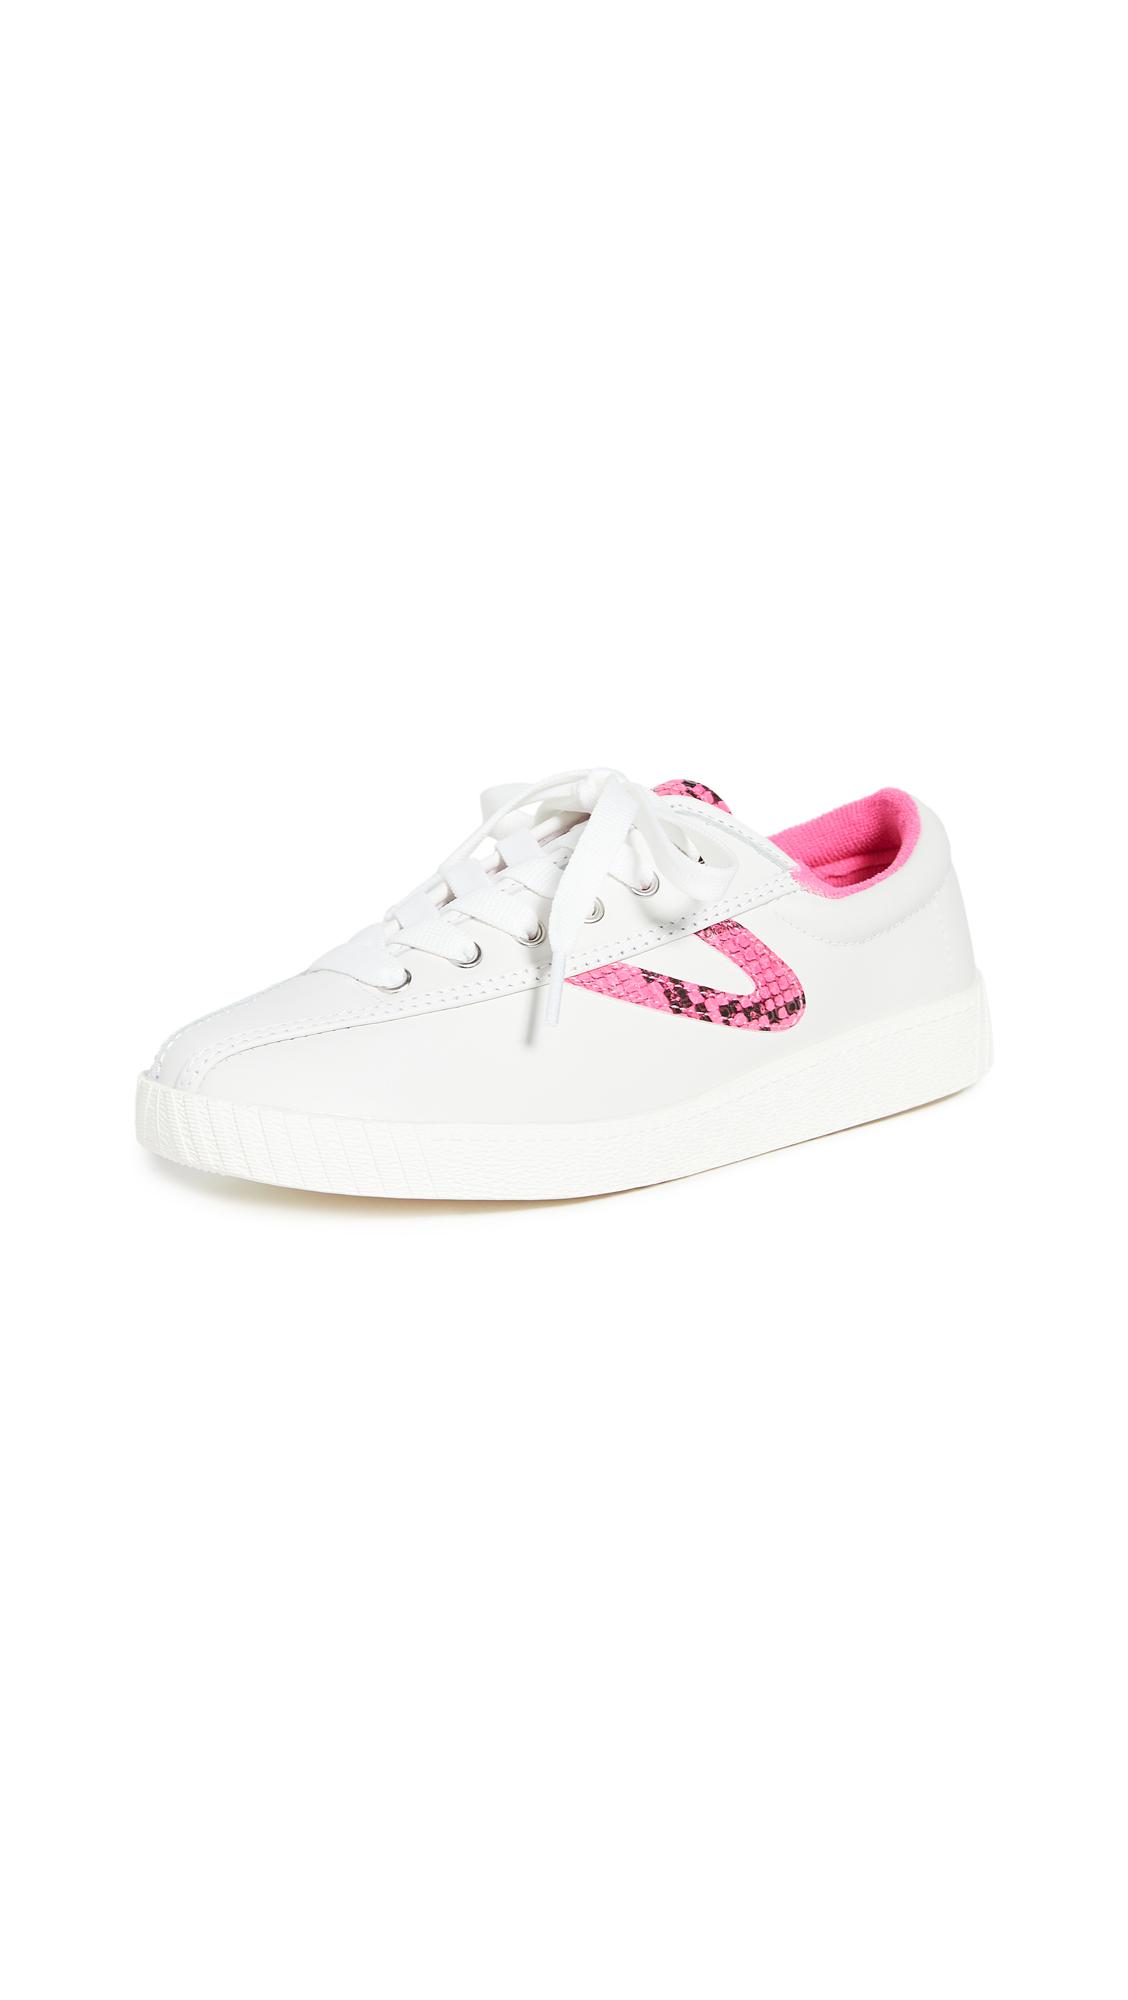 Tretorn Nylite 39 Plus Sneakers - 40% Off Sale